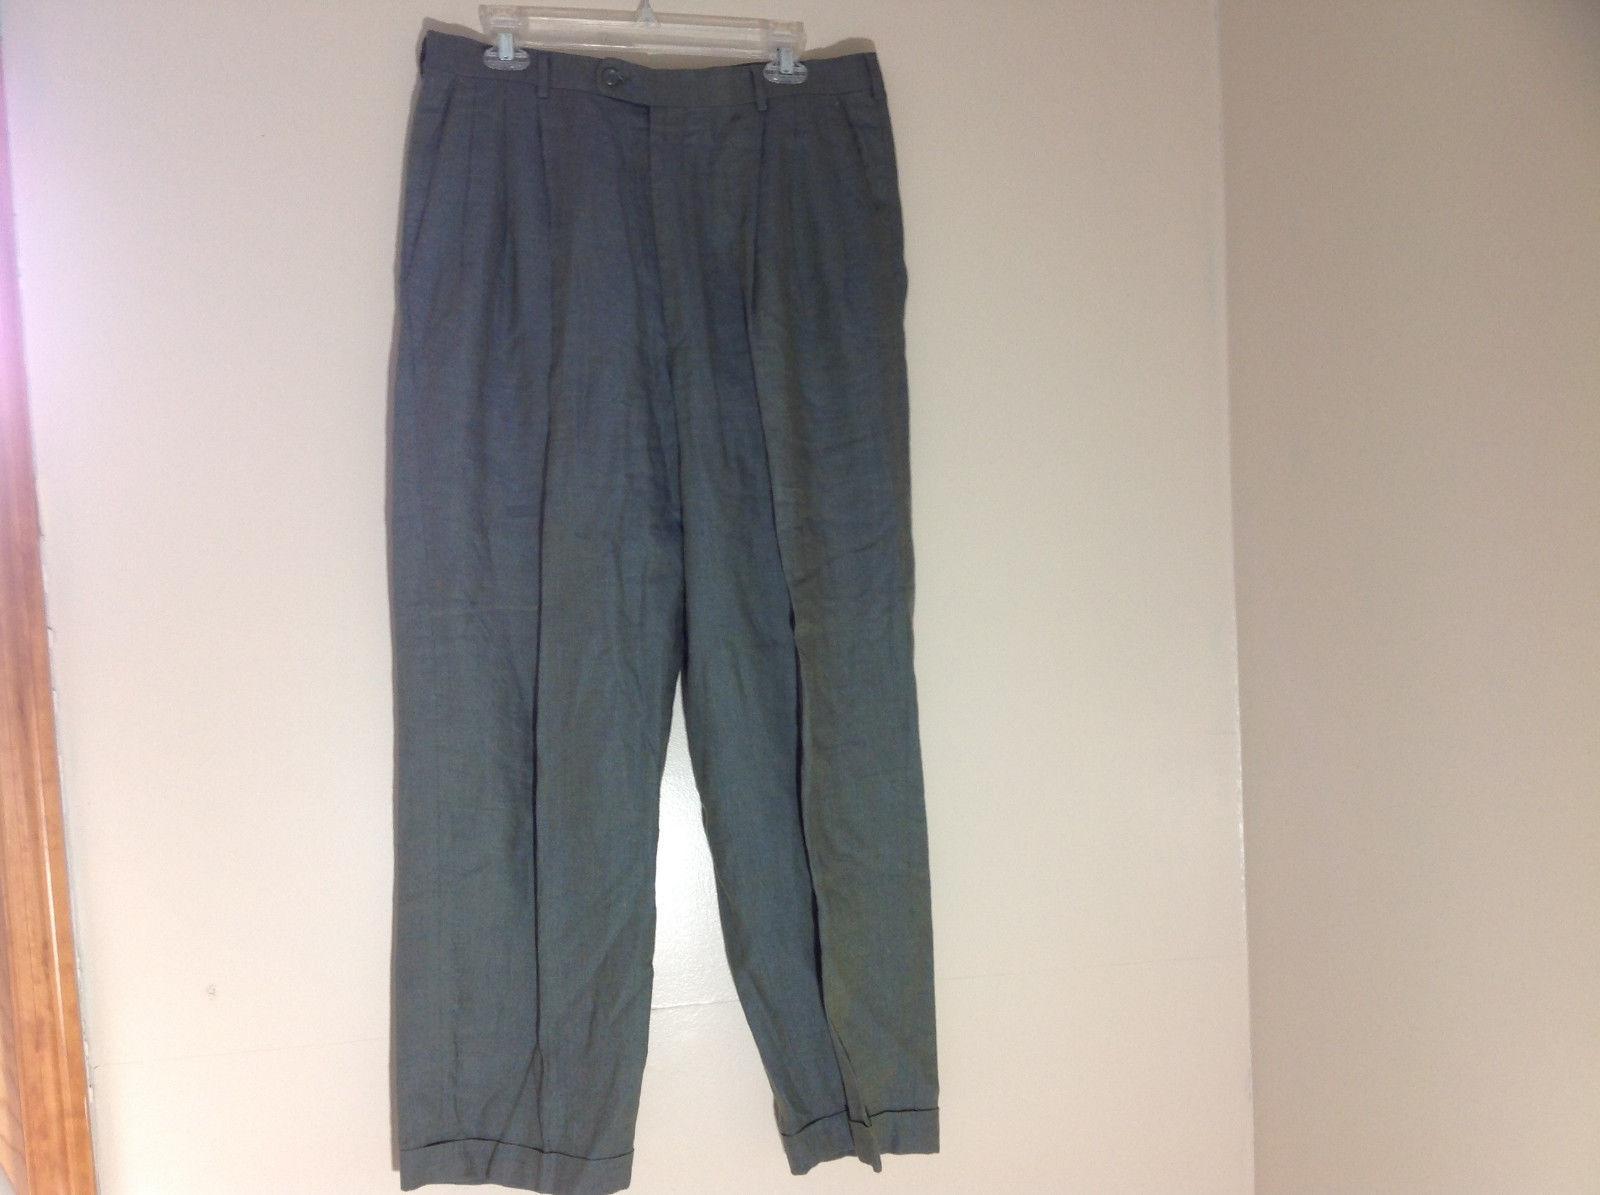 Feldini Blue Green Metallic Like Work Pants Pleated Front Size 34